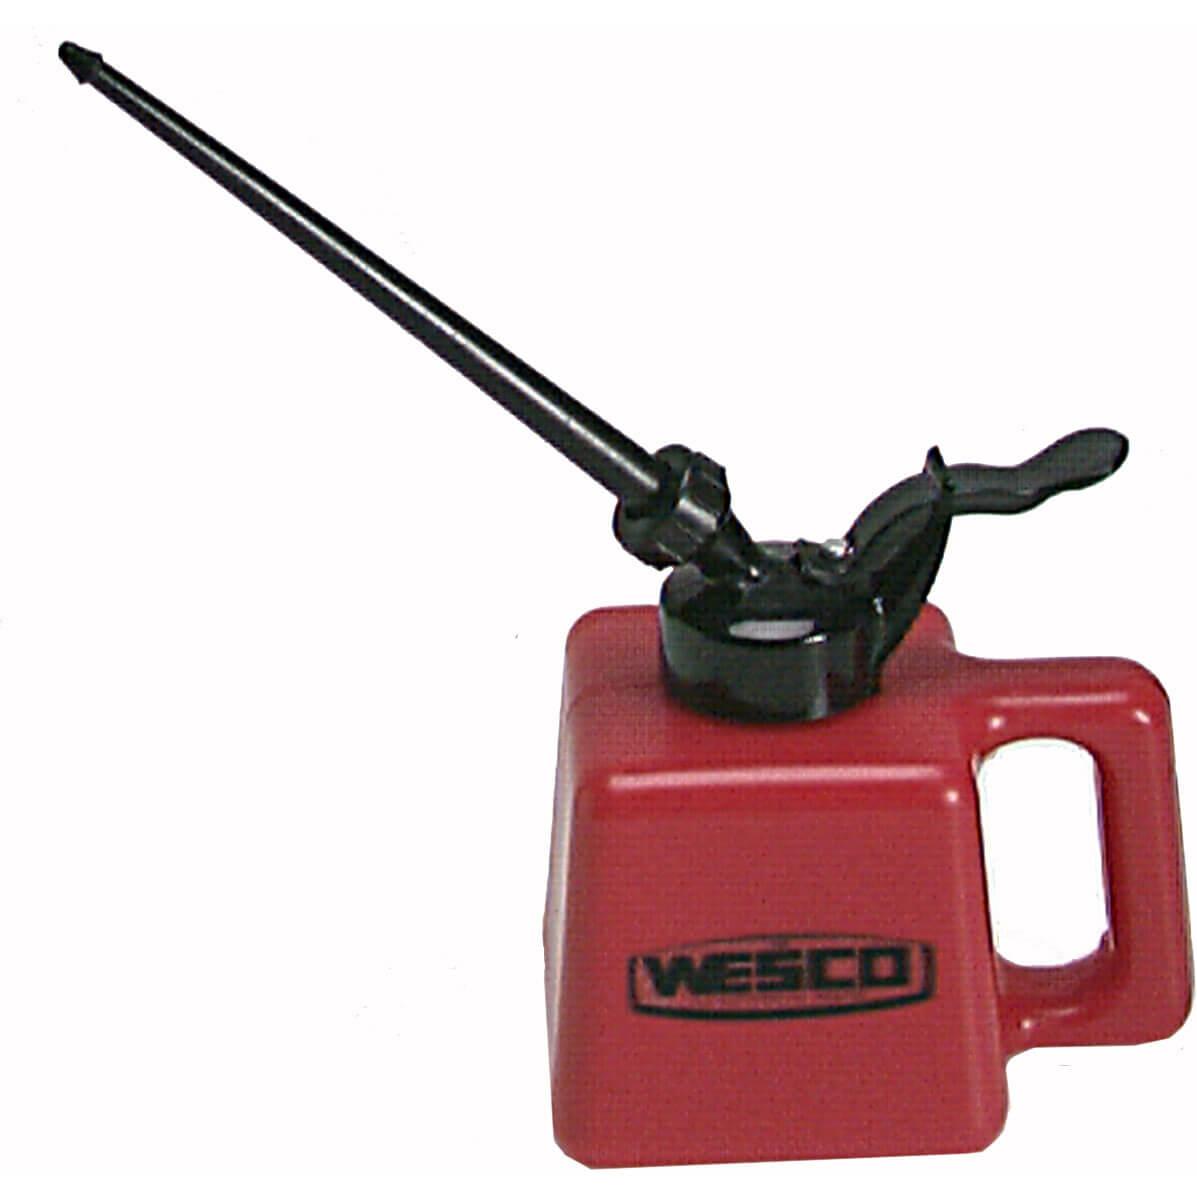 Wesco Polythene Oil Can & Nylon Spout 500ml